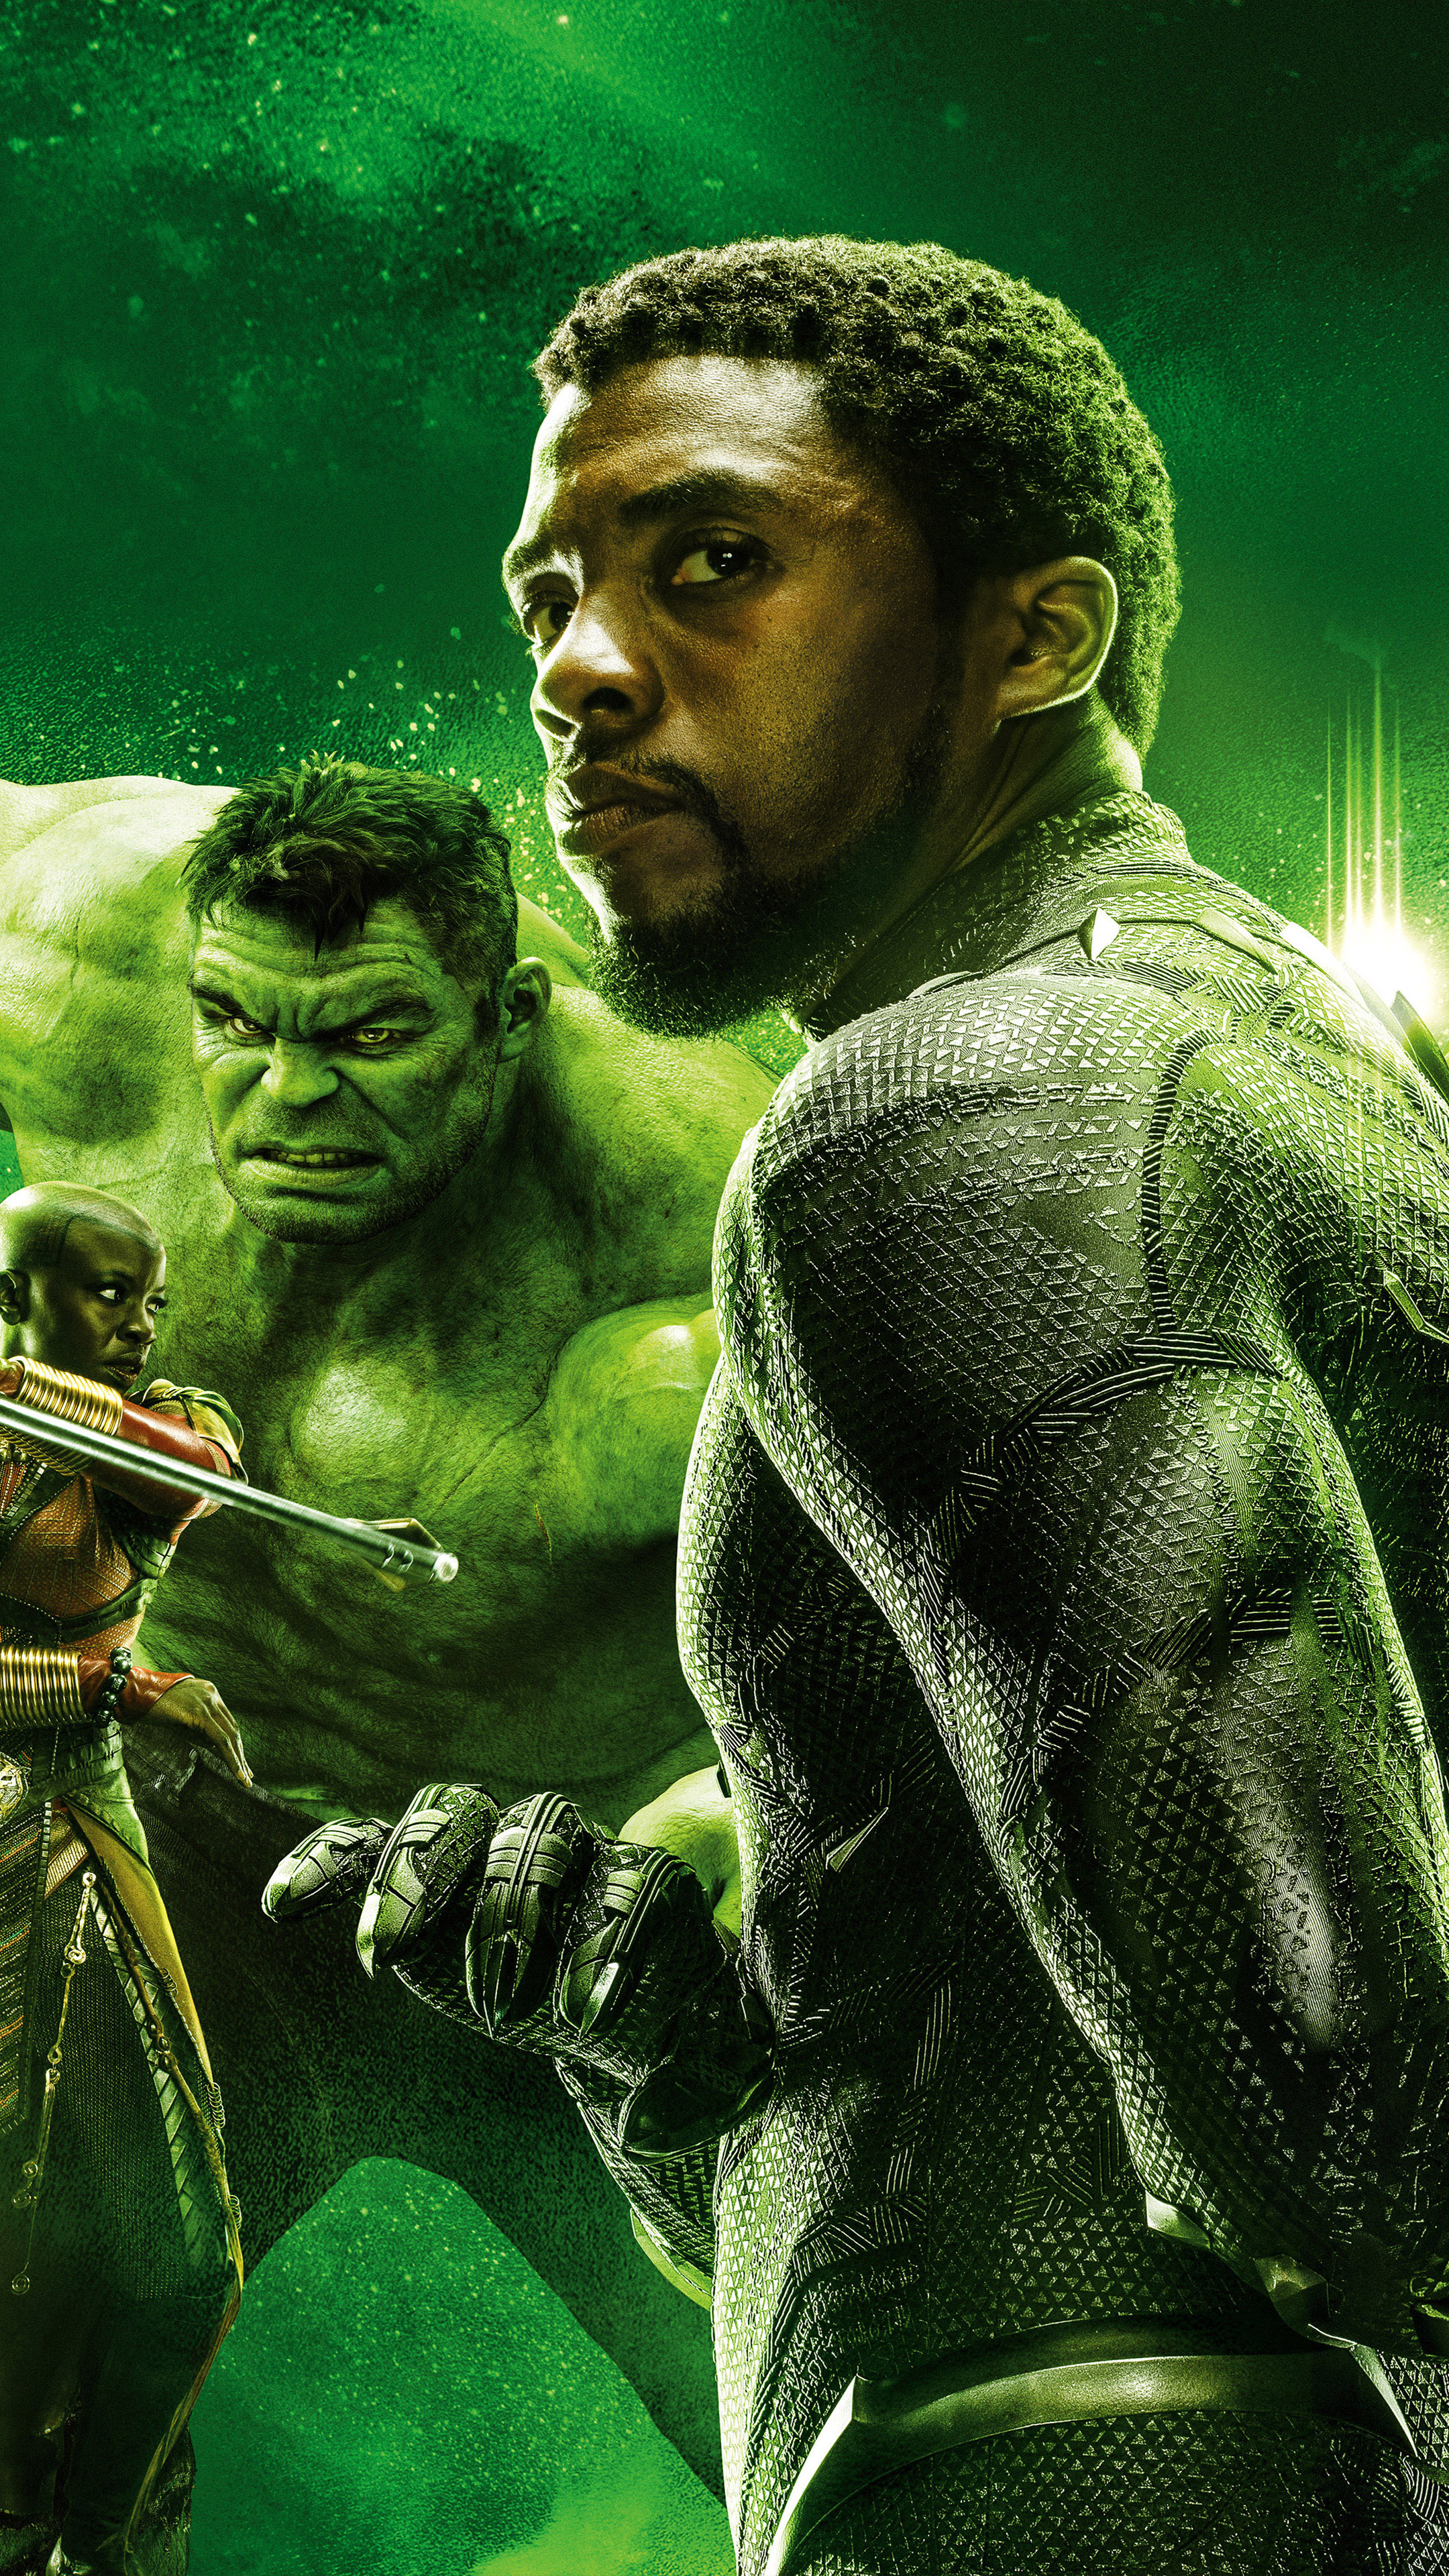 Hulk Black Panther In Avengers Endgame 4k Ultra Hd Mobile Wallpaper